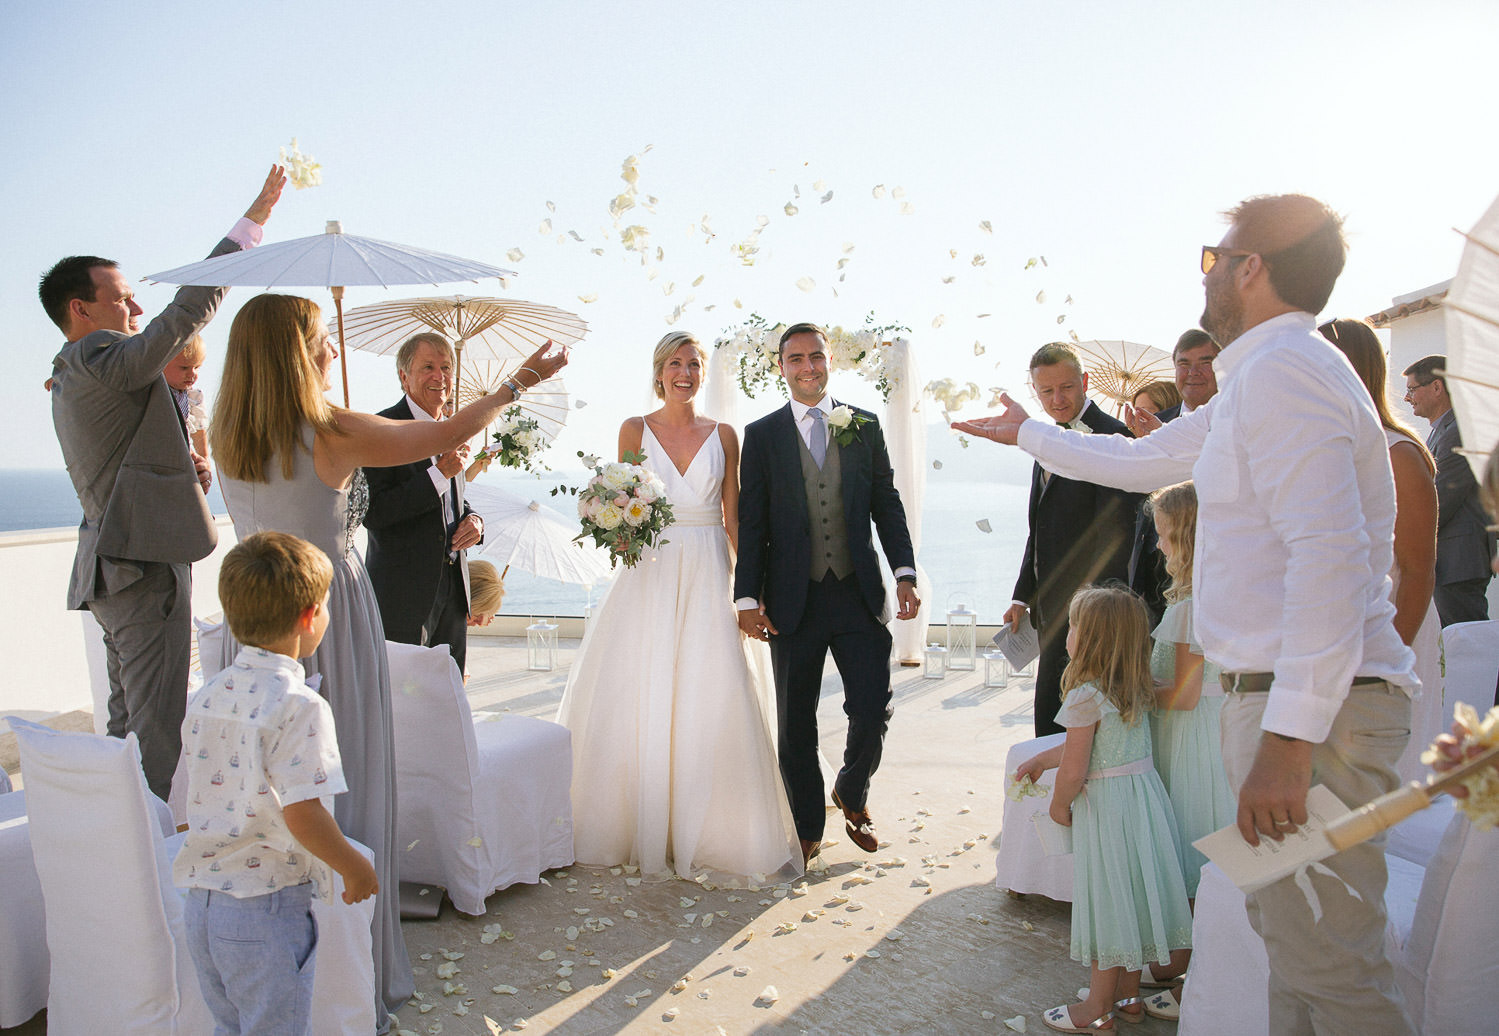 Positano wedding photographer - Intimate ceremony at luxury boutique hotel Casa Angelina in Positano on the Amalfi Coast